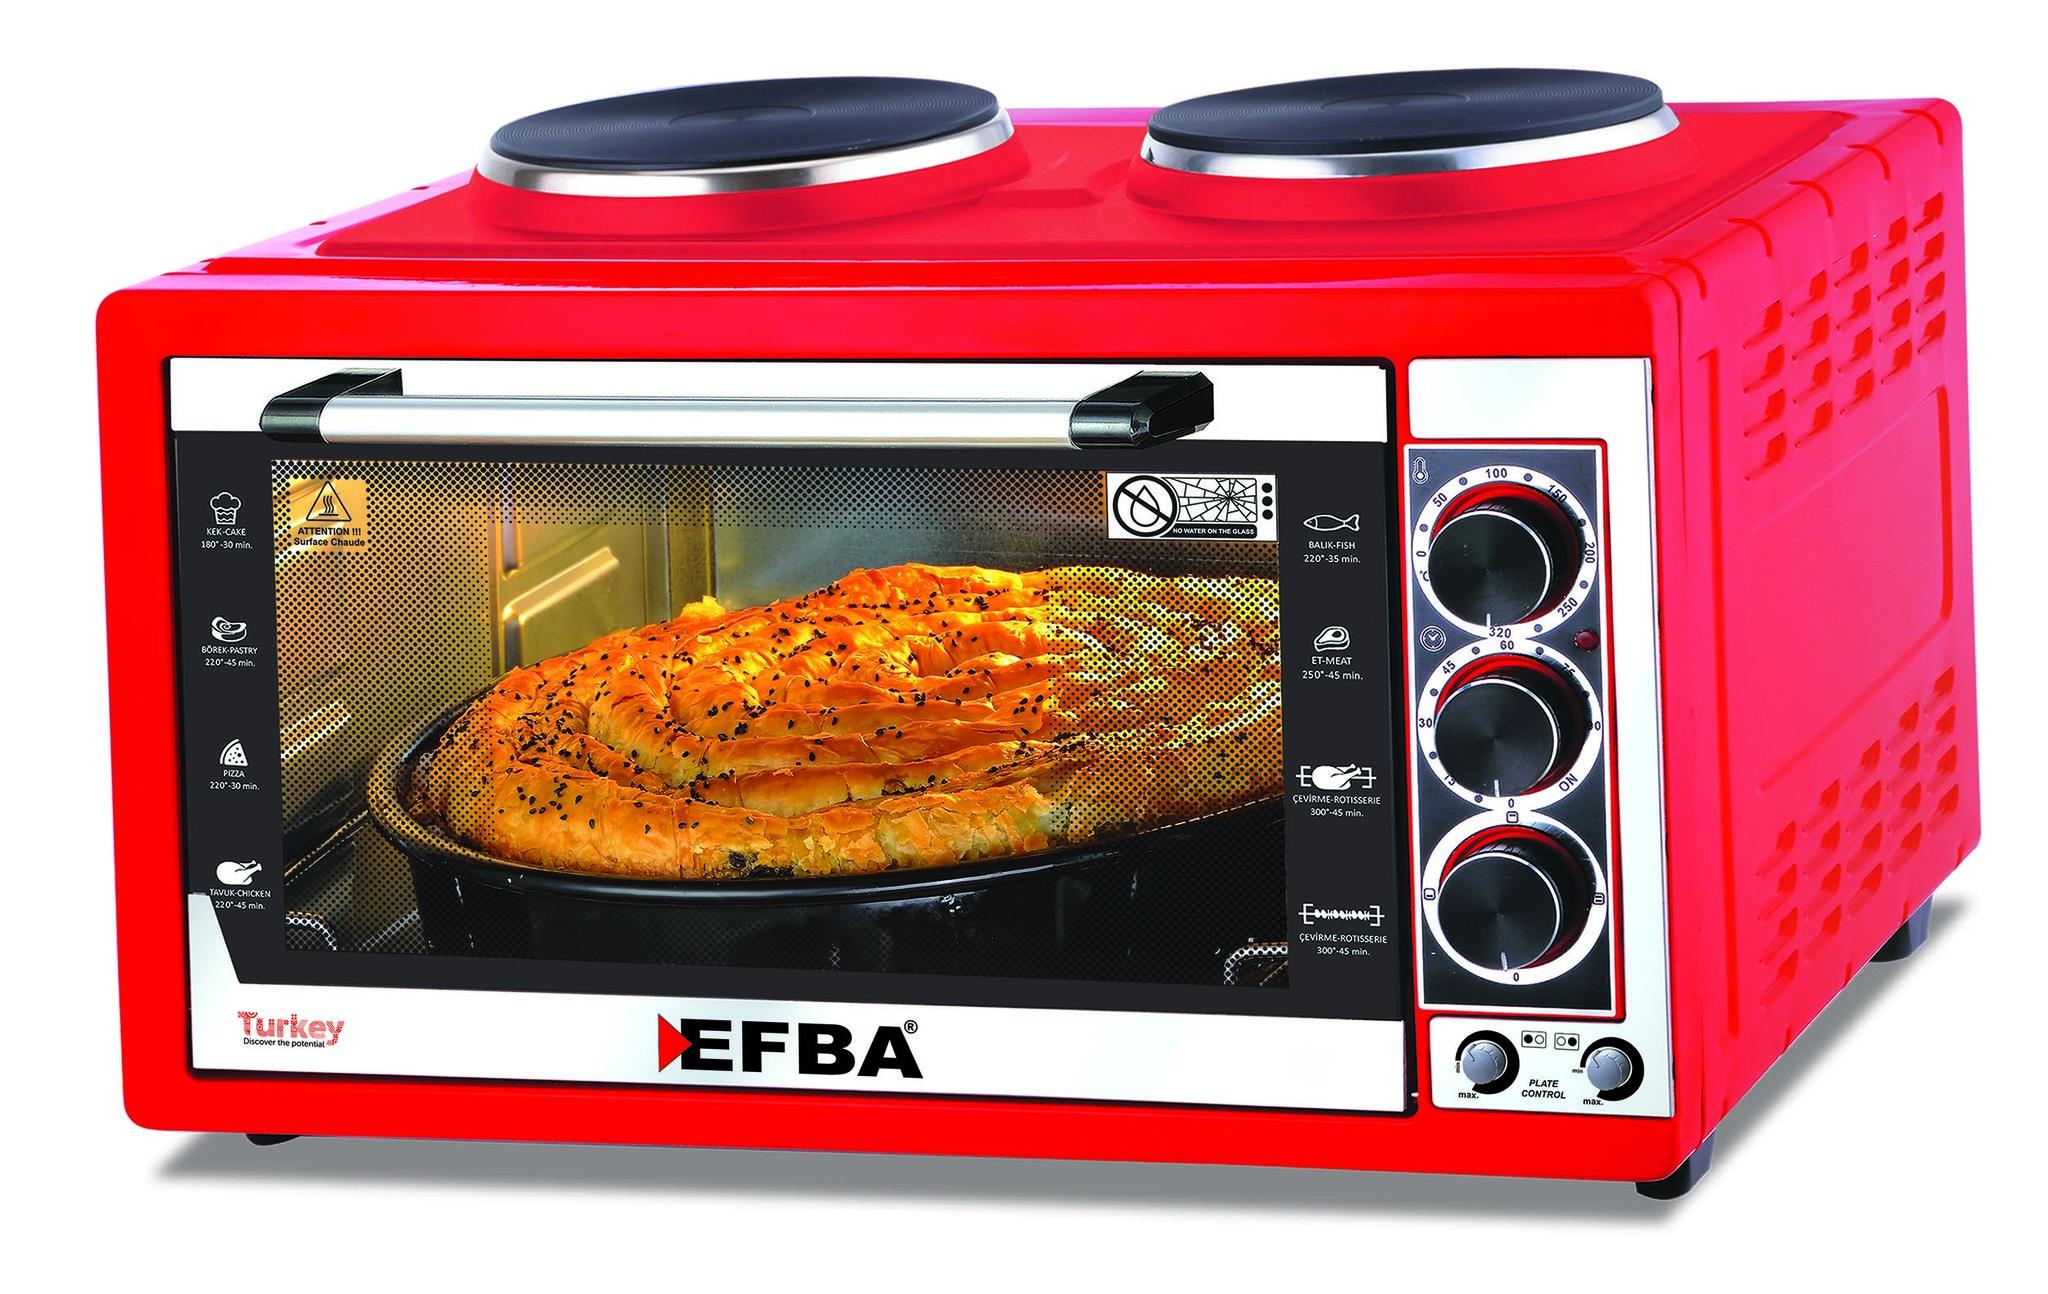 EFBA 5005